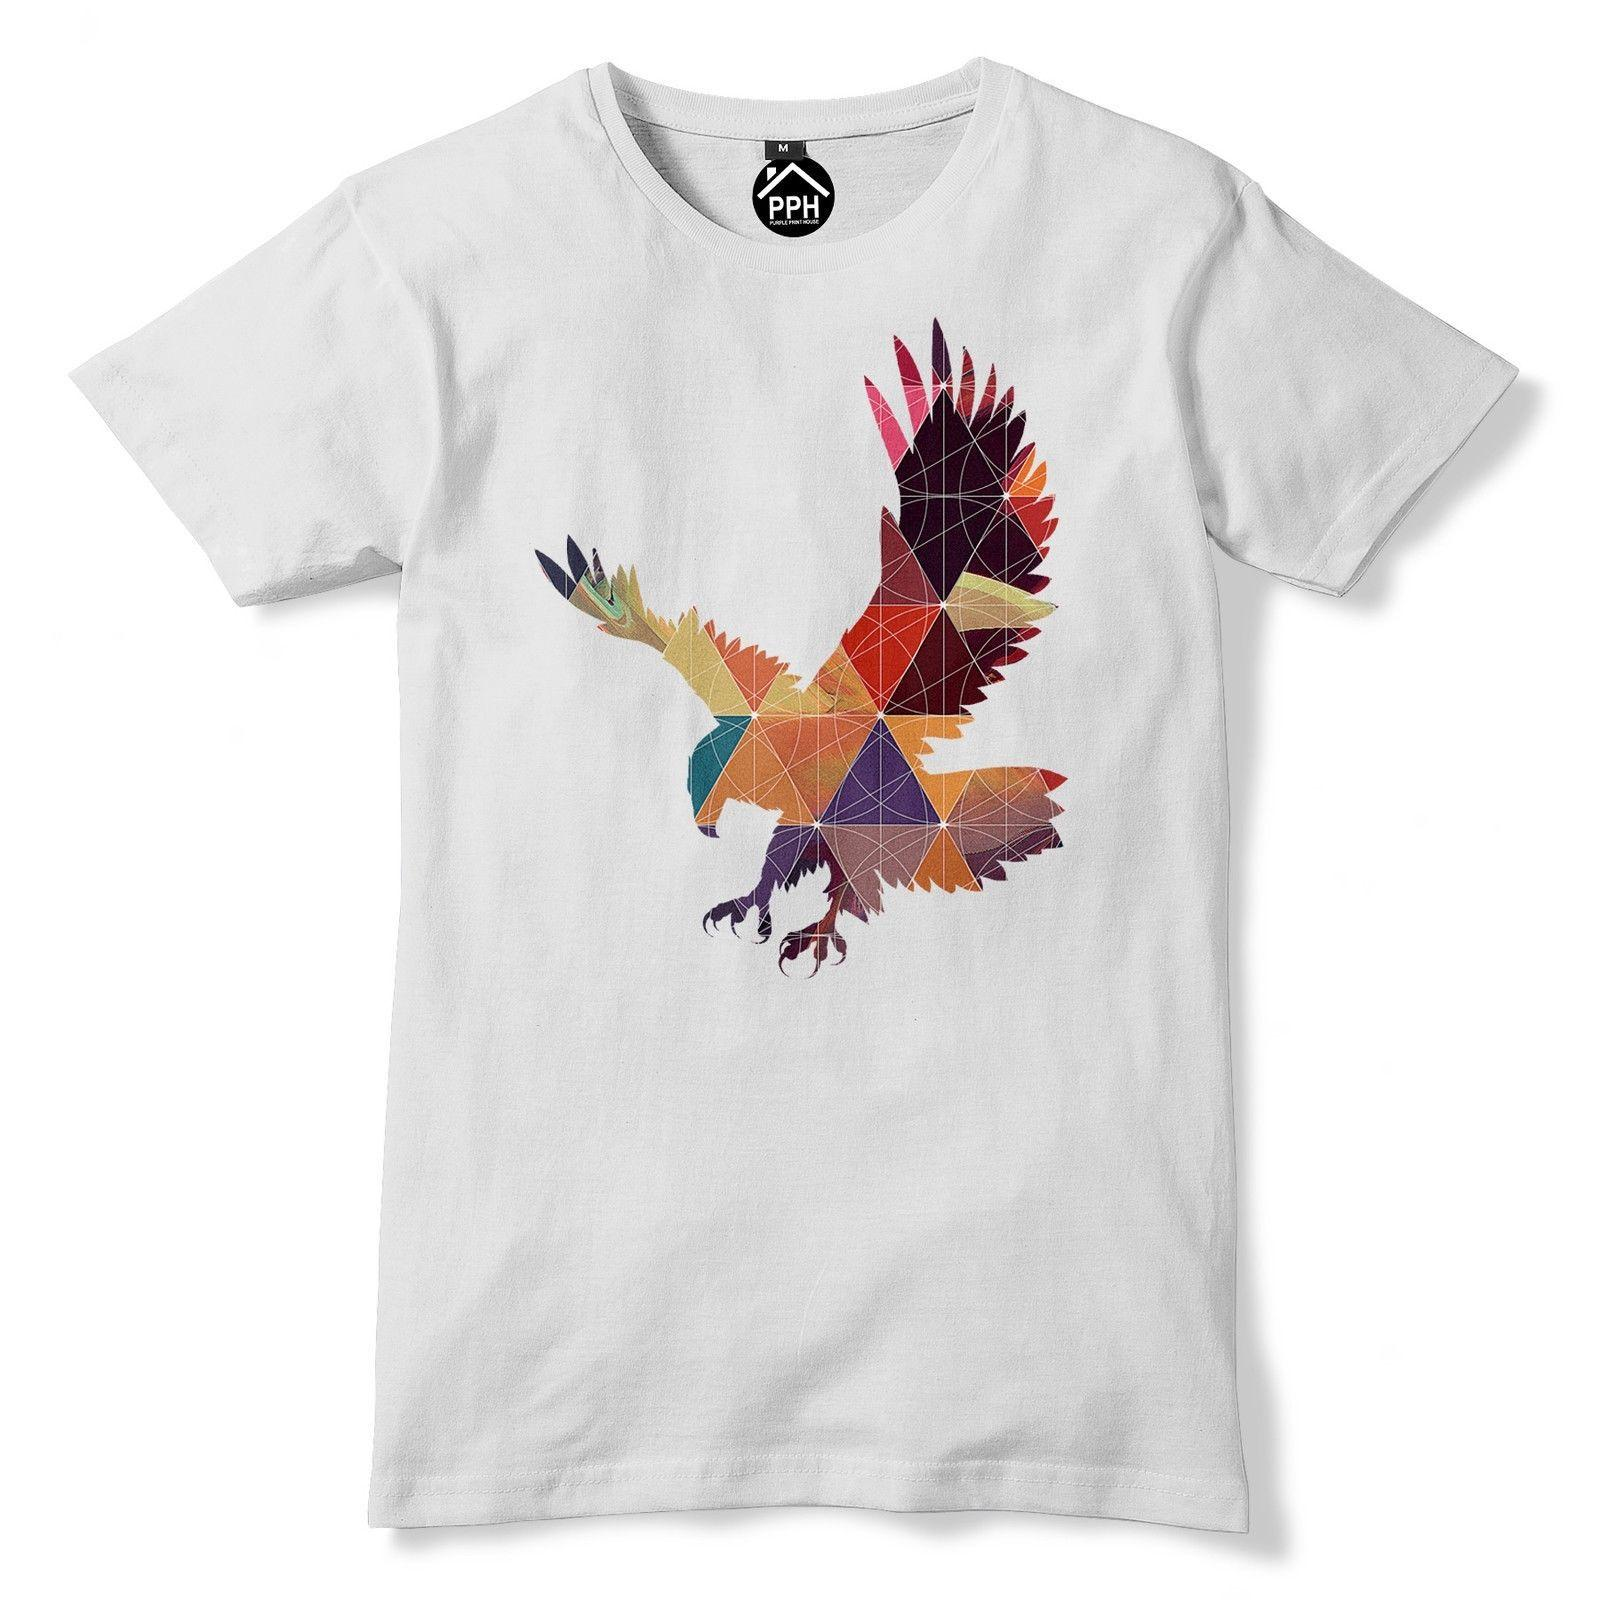 Geometric golden eagle t shirt bird hawk animal funny hipster triangle tshirt 74 personality 2018 brand short sleeve tops tee hip t shirt logos trendy t